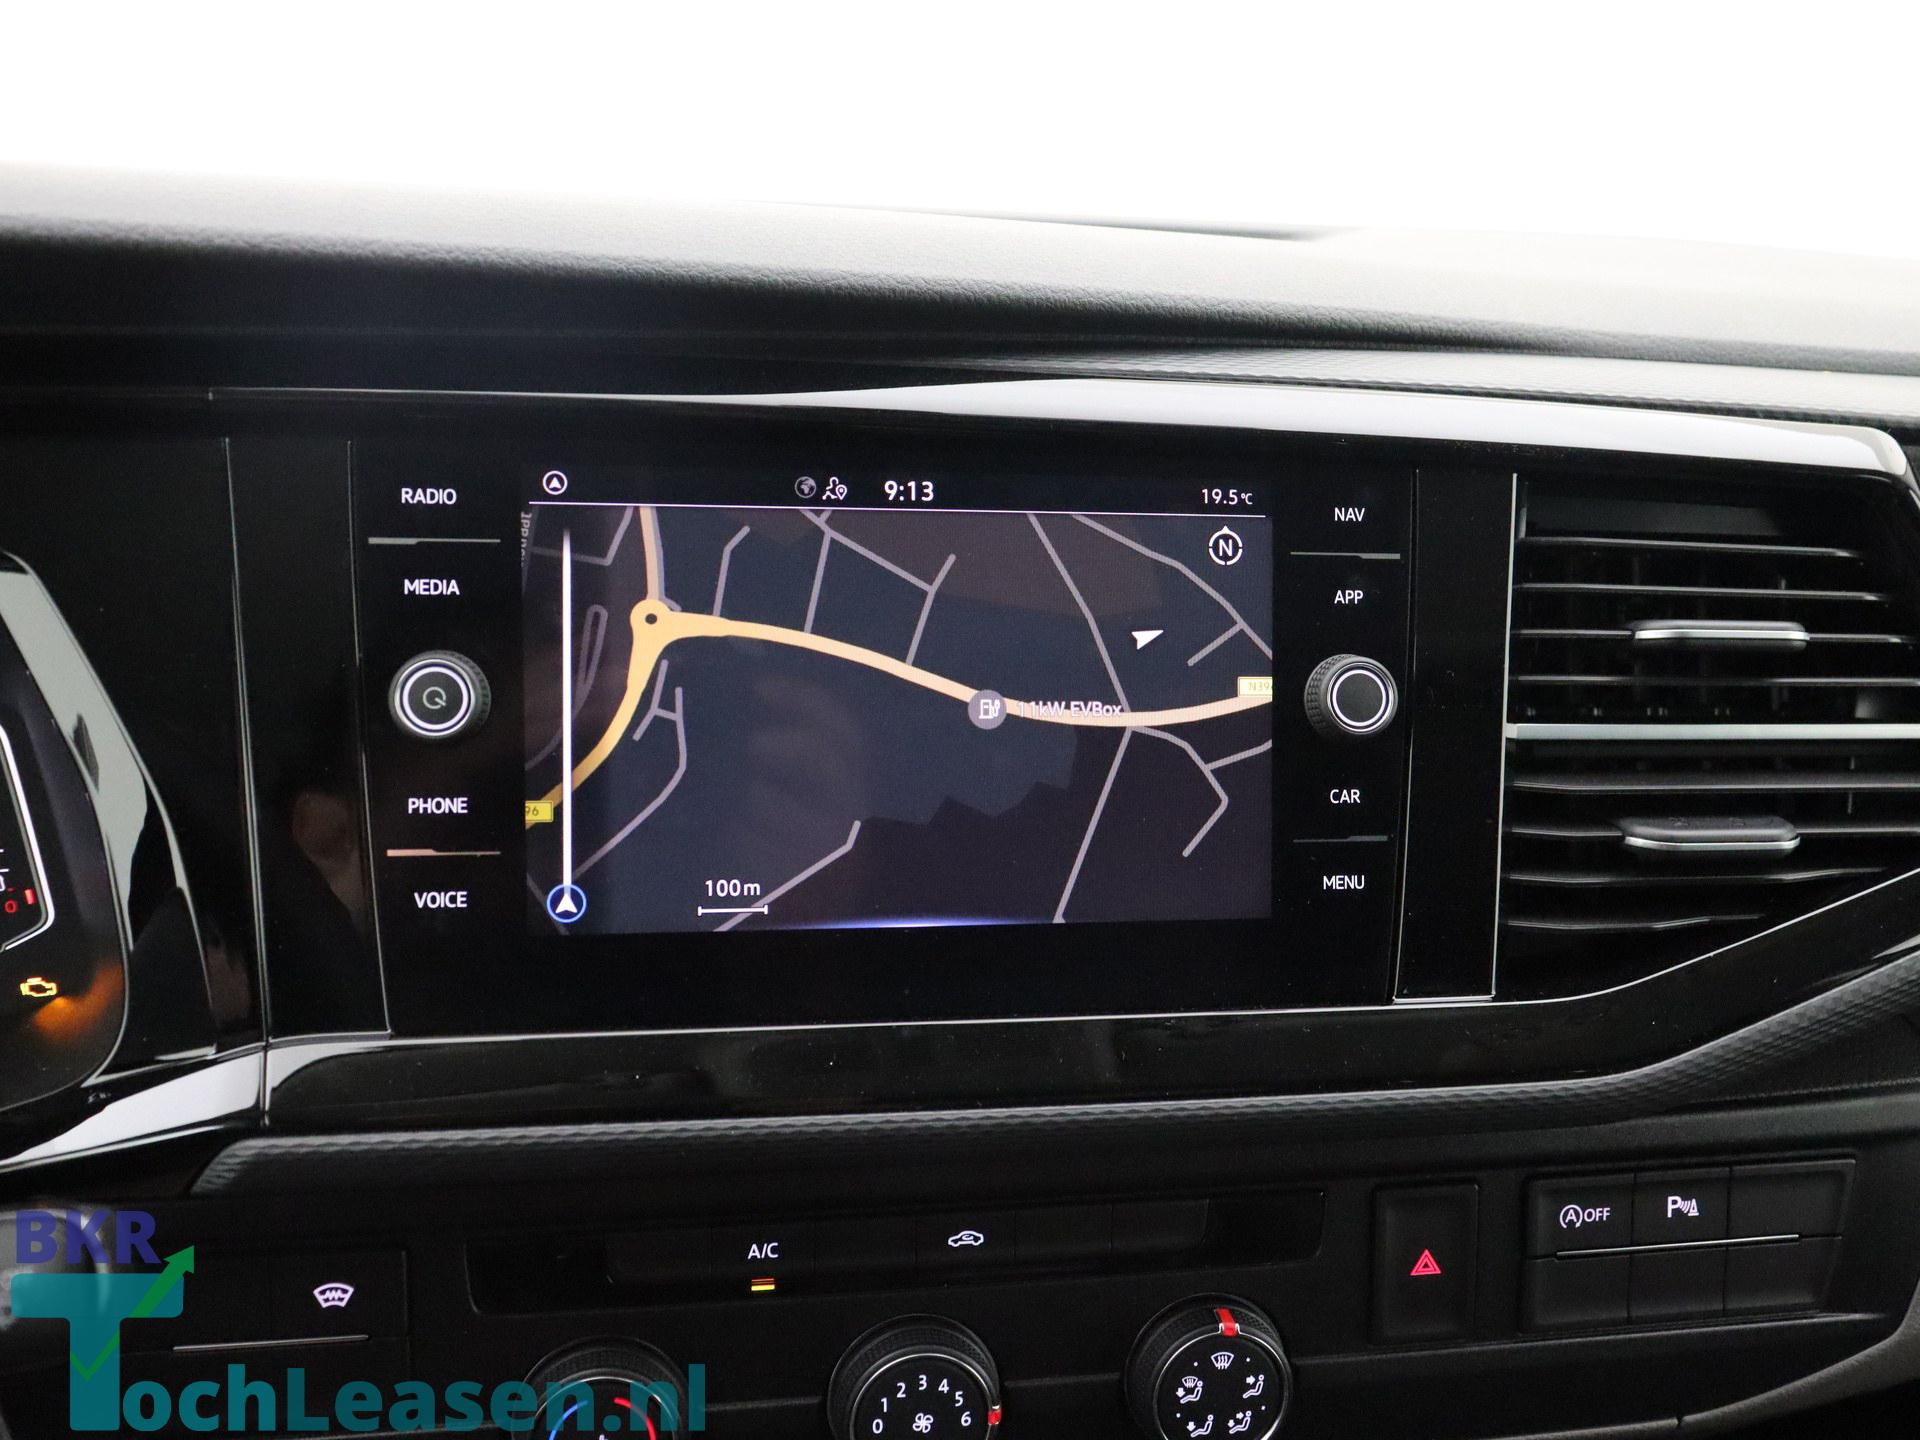 BKR toch leasen - Volkswagen Transporter - Grijs 10